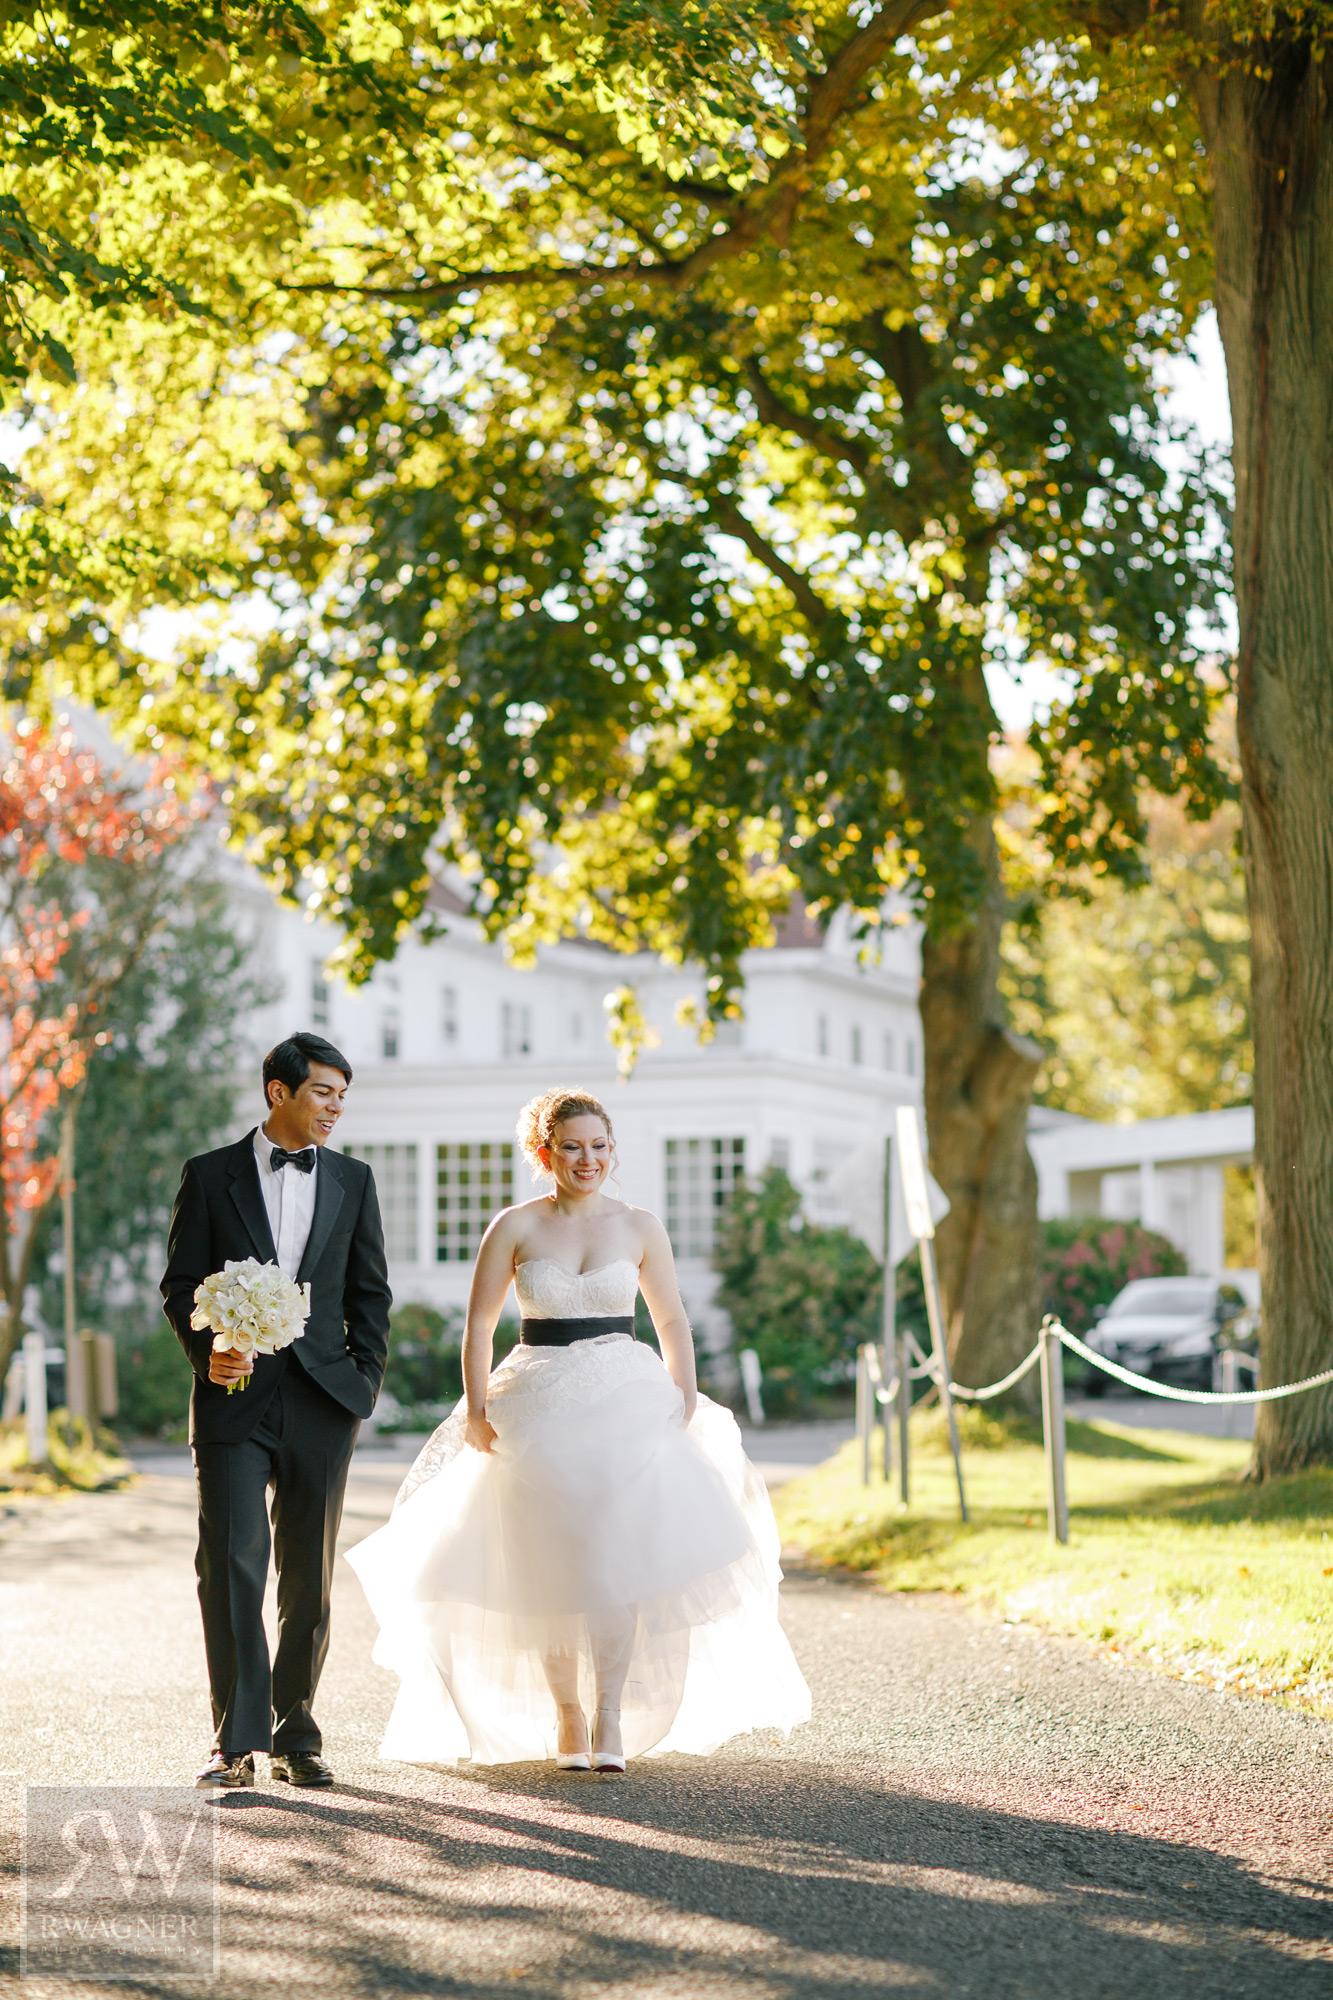 ceci_new_york_luxury_wedding_invitations_couture_red_black_white_real_wedding_dramatic_inn_at_longshore_v286_14.jpg